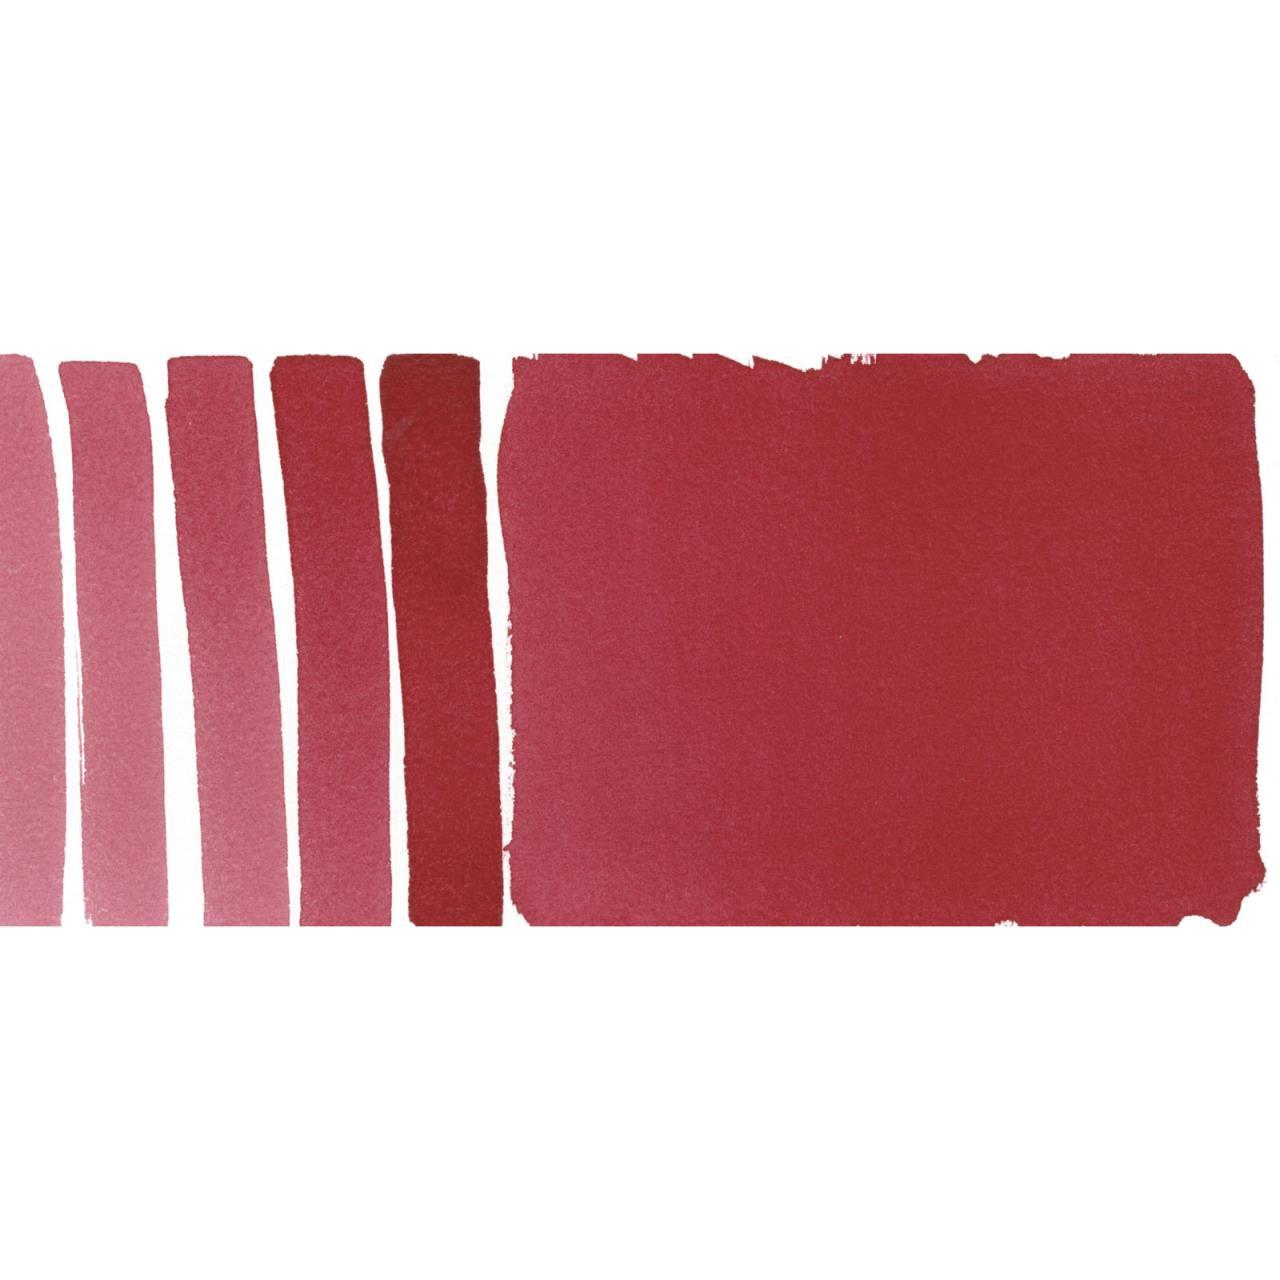 Quinacridone Fuchsia, DANIEL SMITH Extra Fine Watercolors 15ml Tubes -